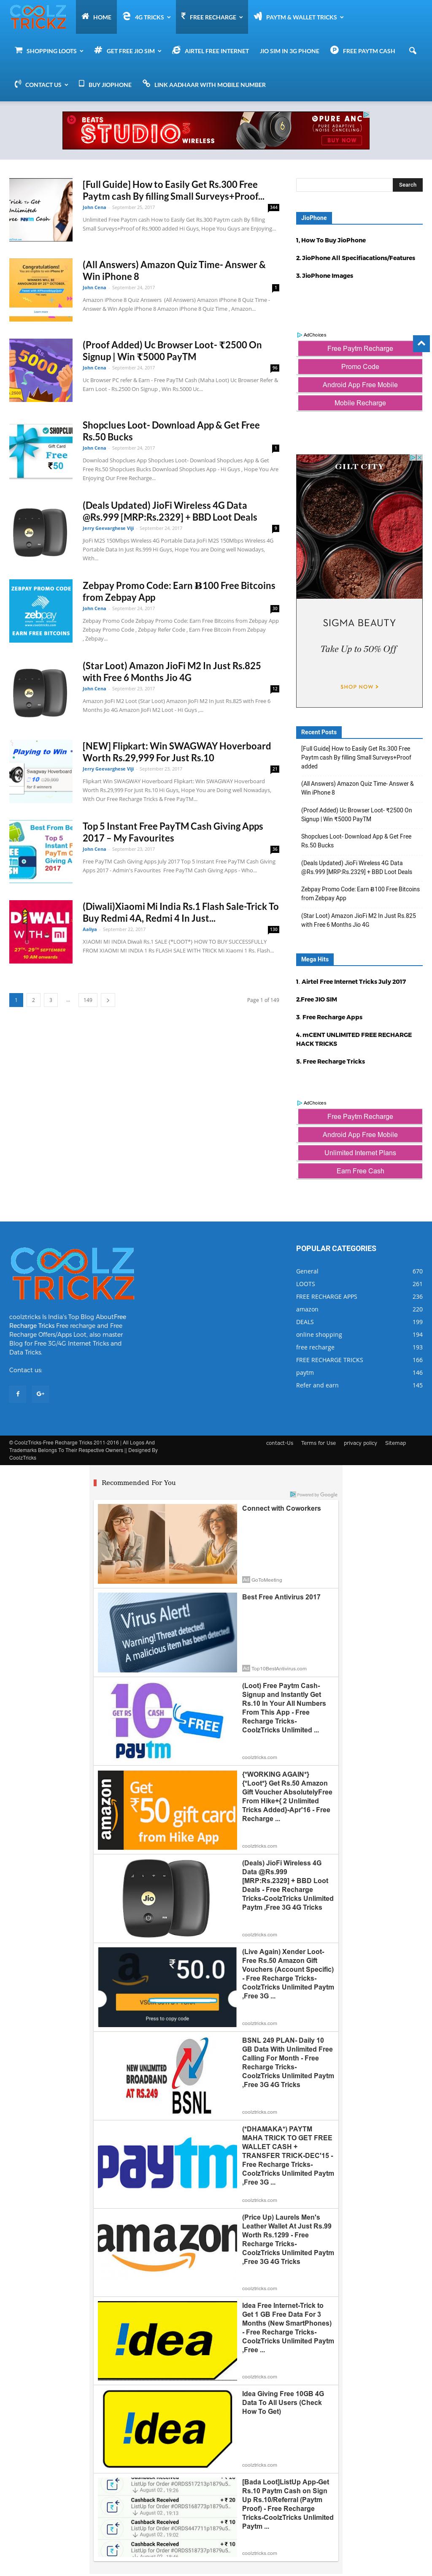 e76aada30b47e5 Coolztricks Competitors, Revenue and Employees - Owler Company Profile